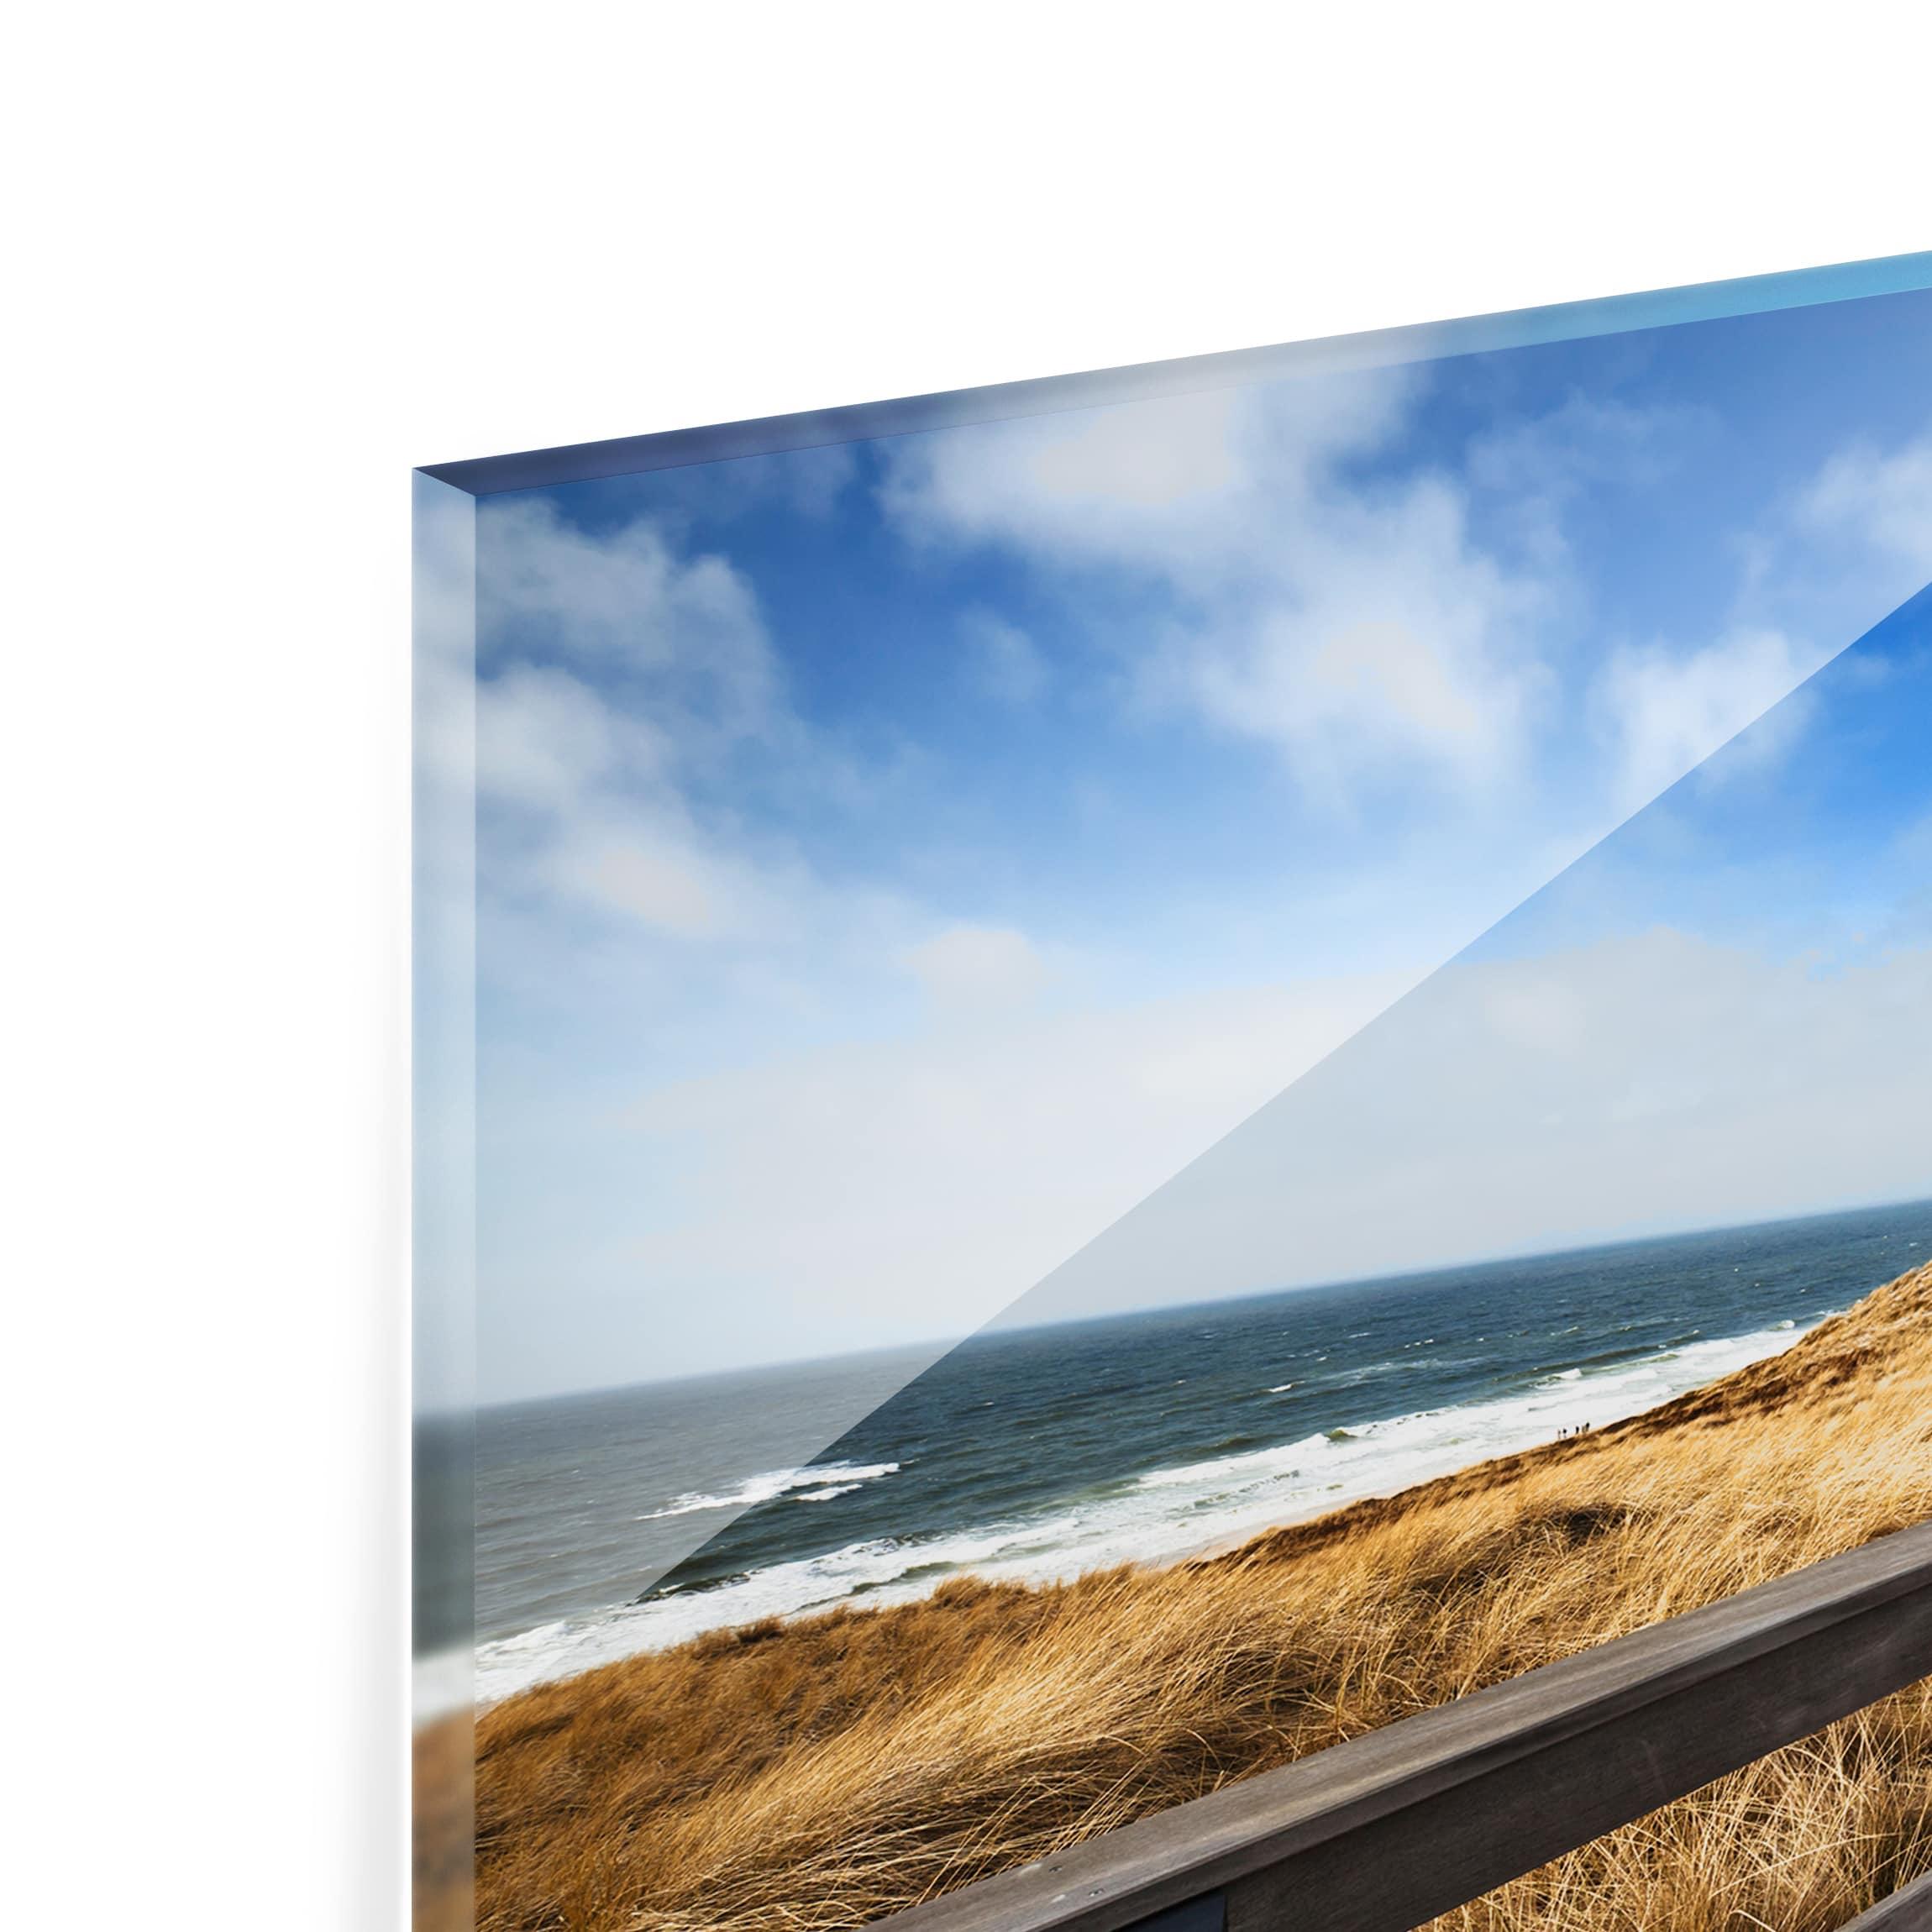 spritzschutz glas nordseespaziergang quer 2 3. Black Bedroom Furniture Sets. Home Design Ideas